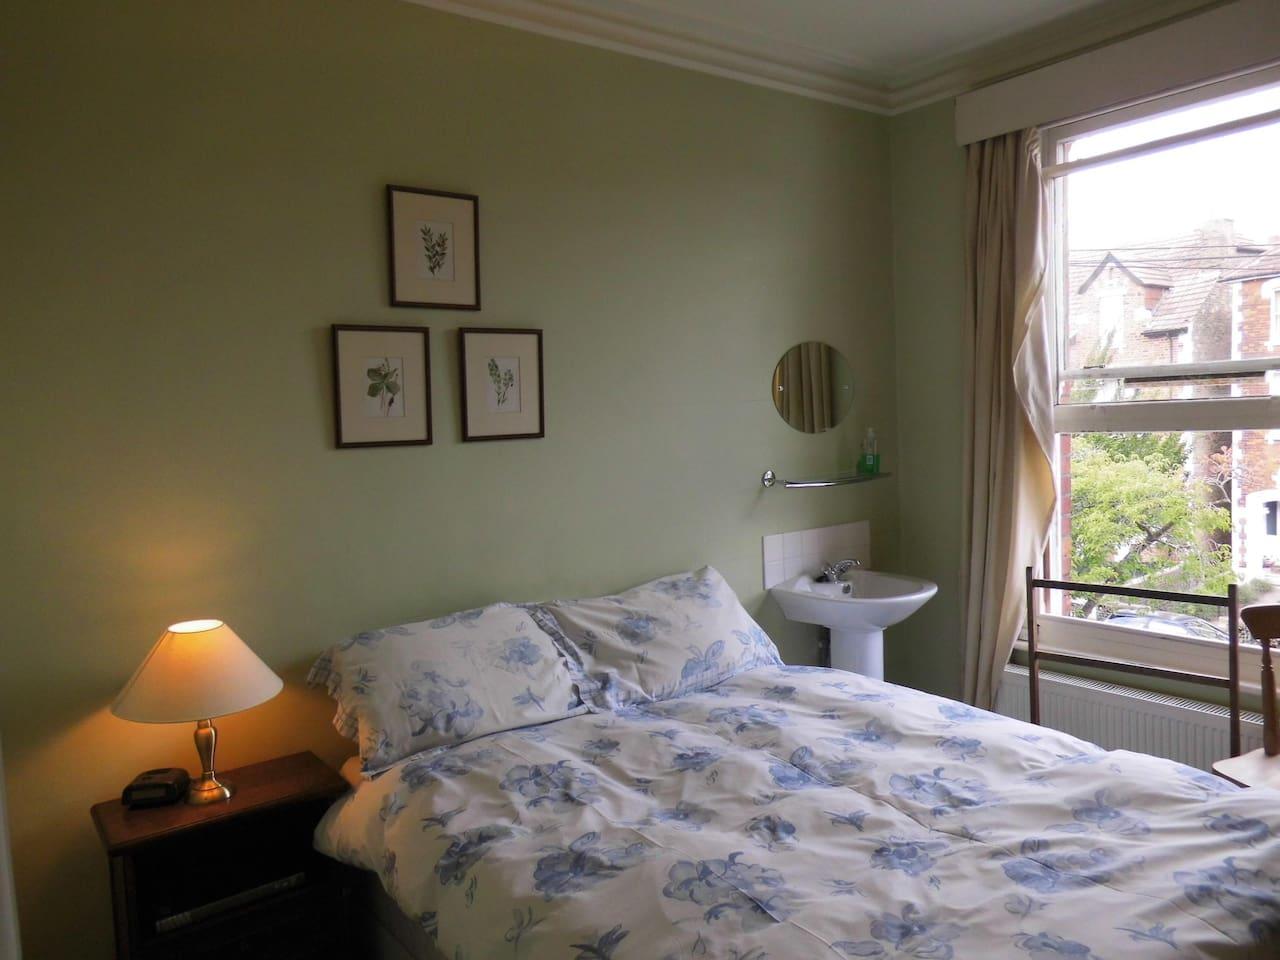 Room 3 Budget double room - shared bathroom -  image 1